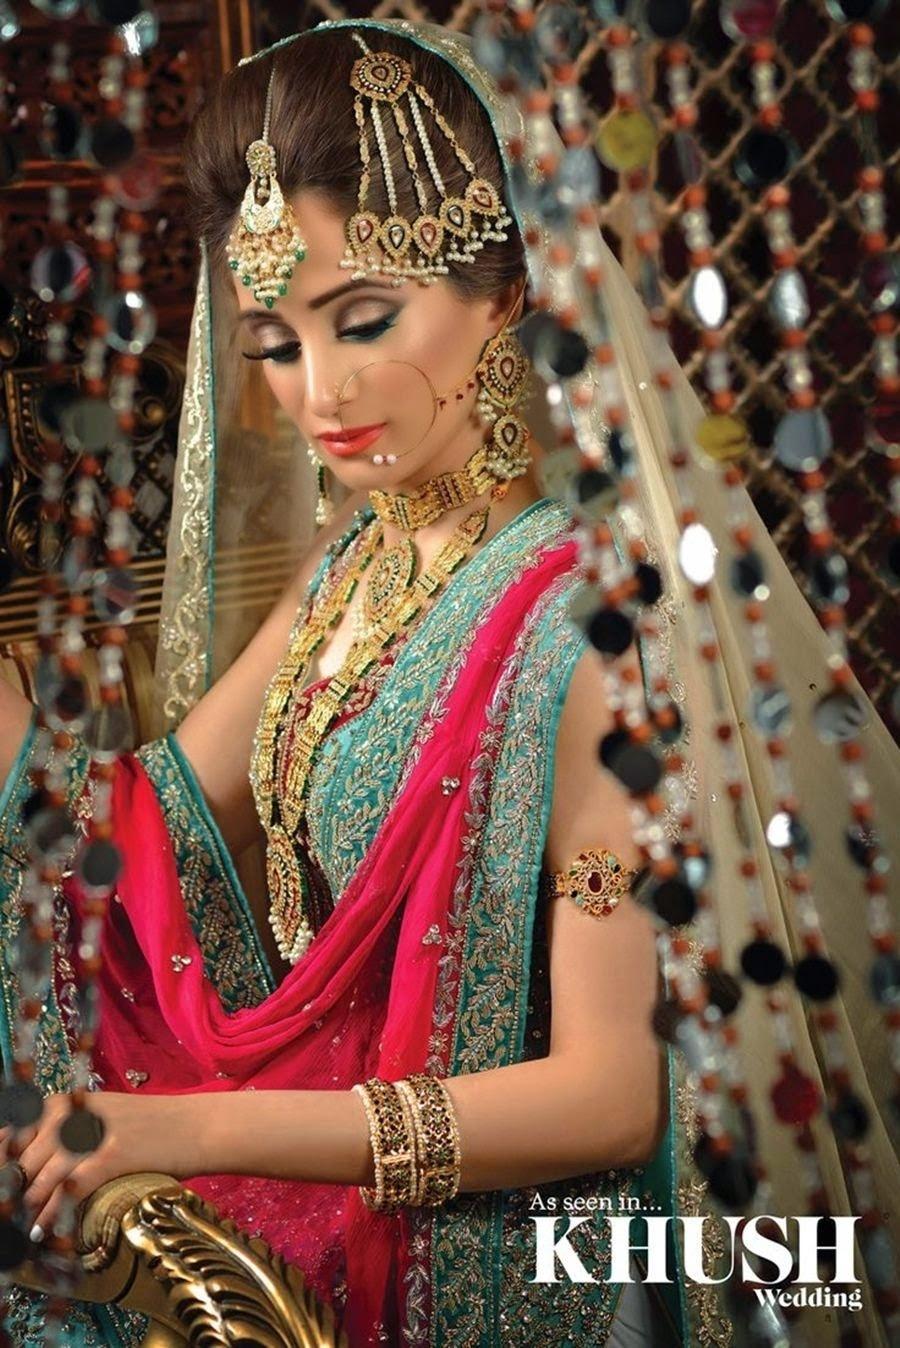 pakistani bridal makeup pictures facebook - wavy haircut